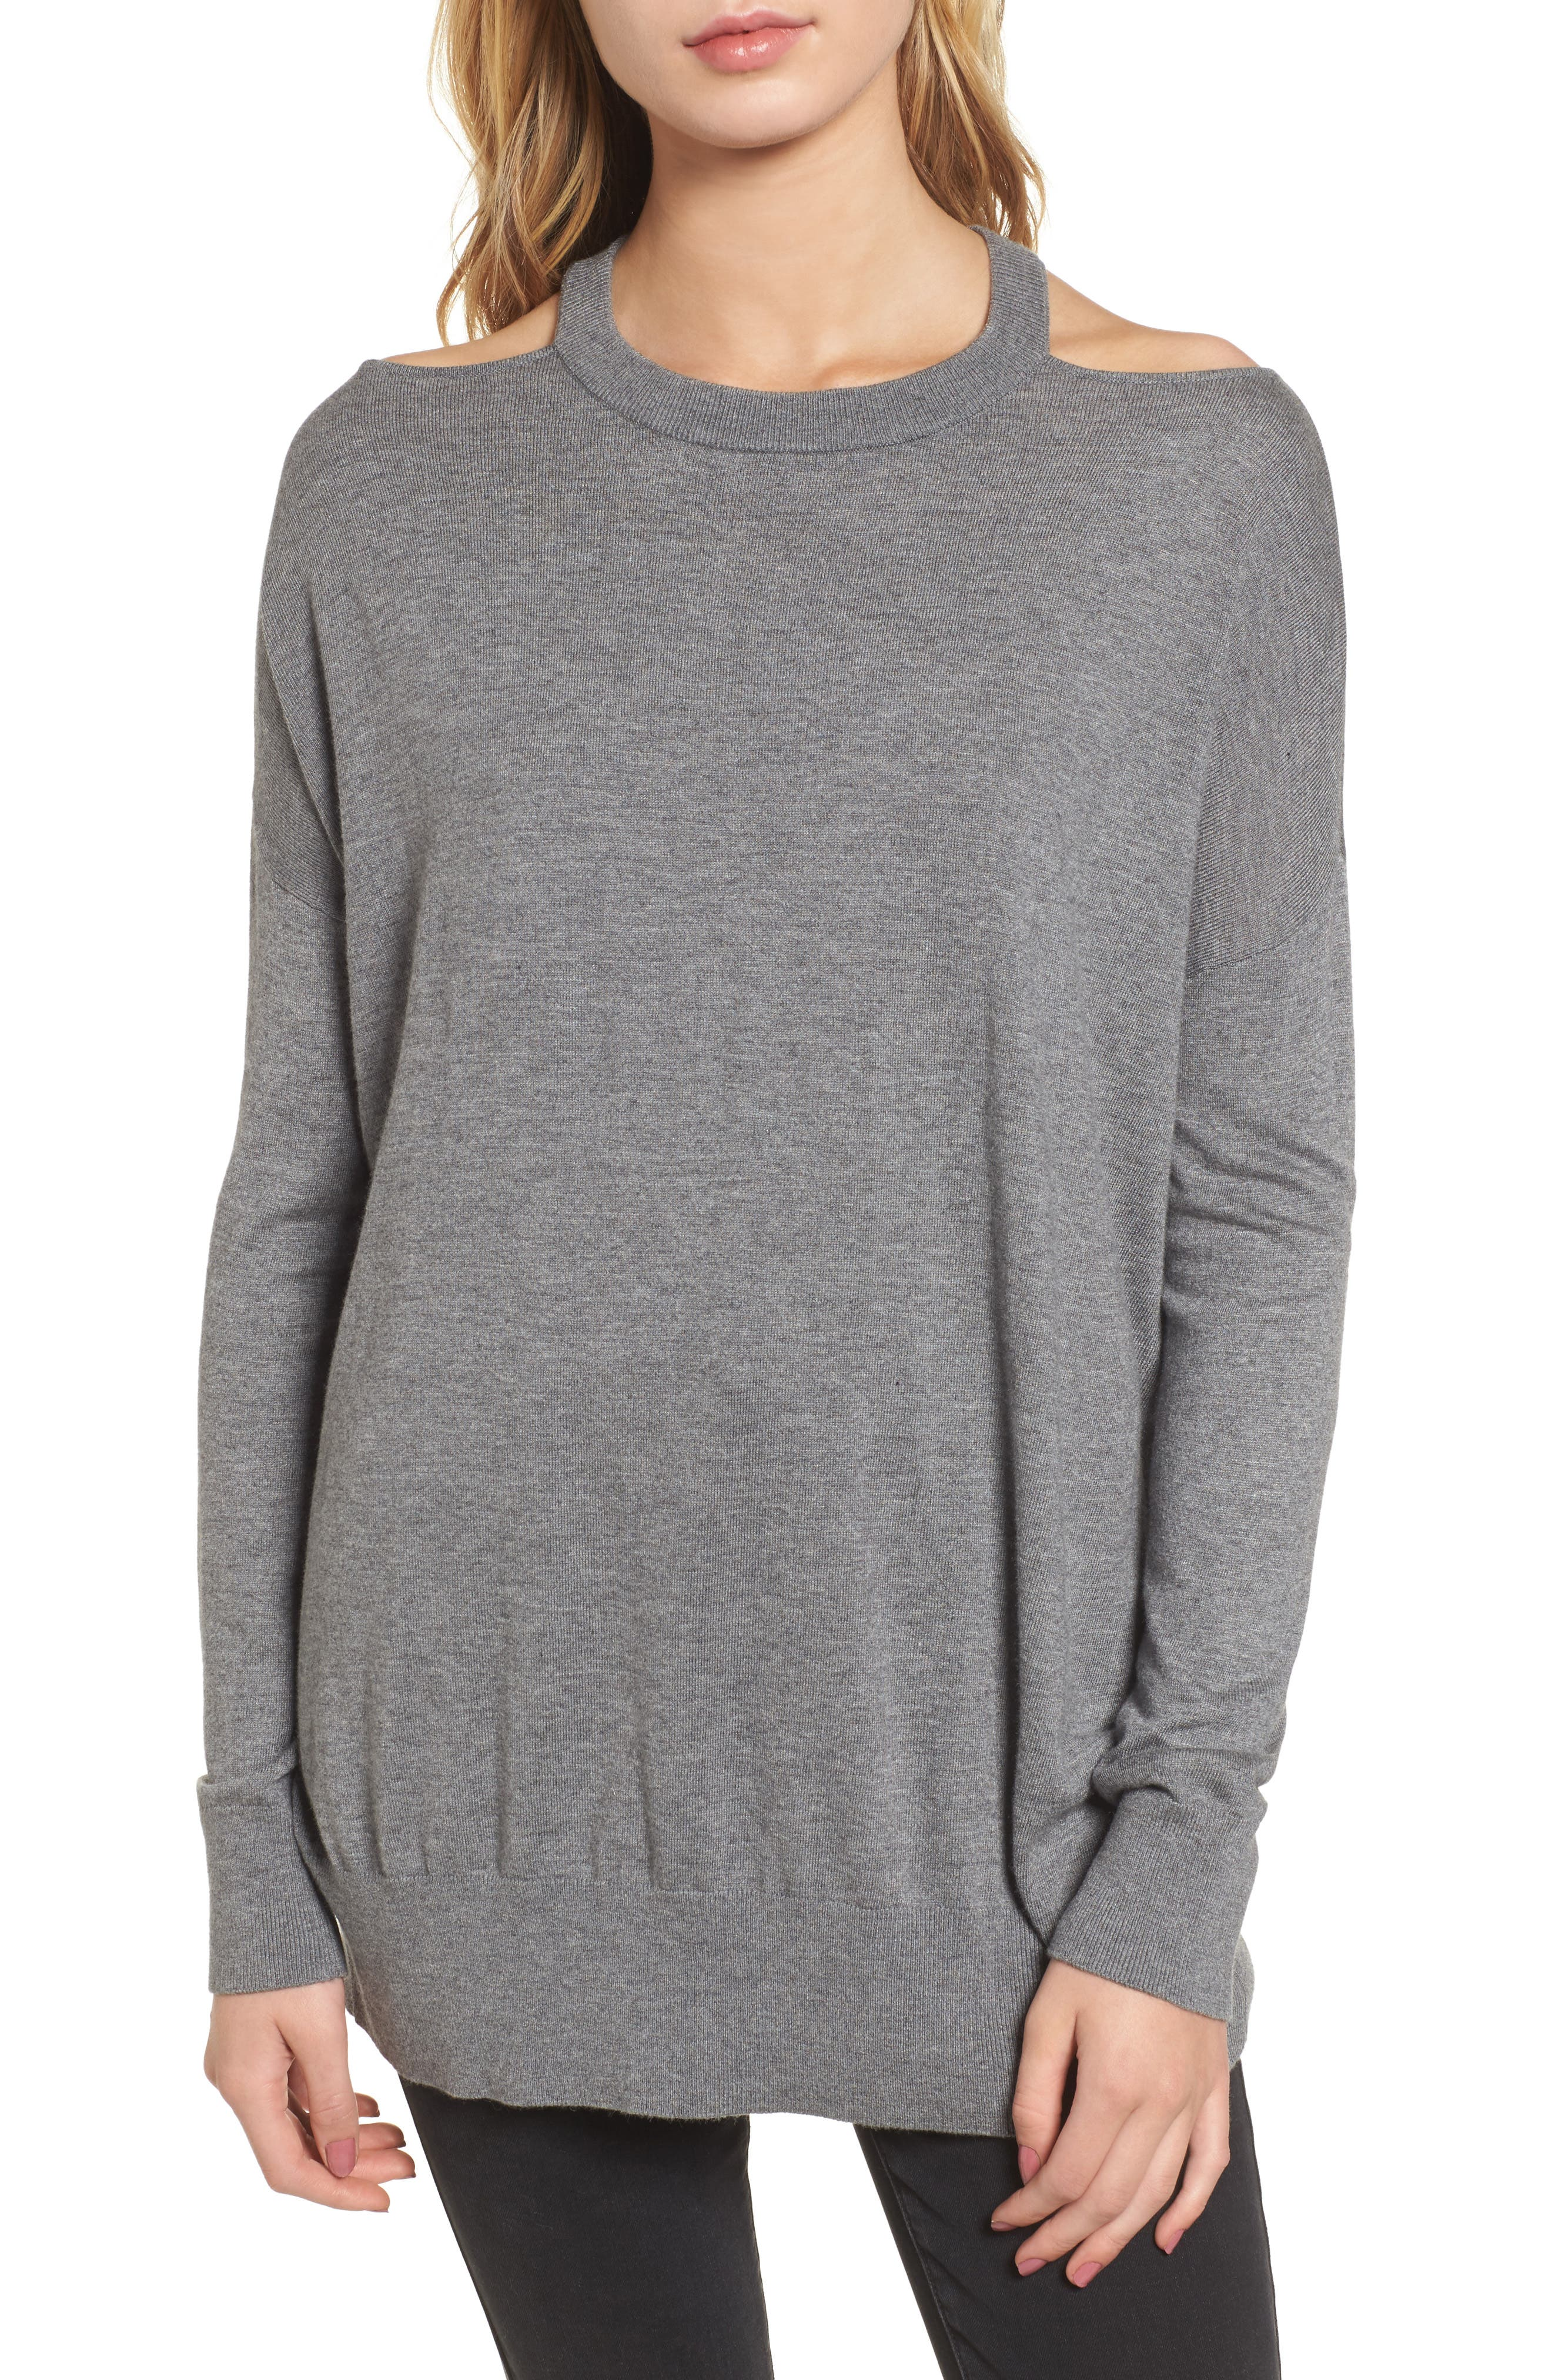 Canarise Cutout Sweater,                             Main thumbnail 1, color,